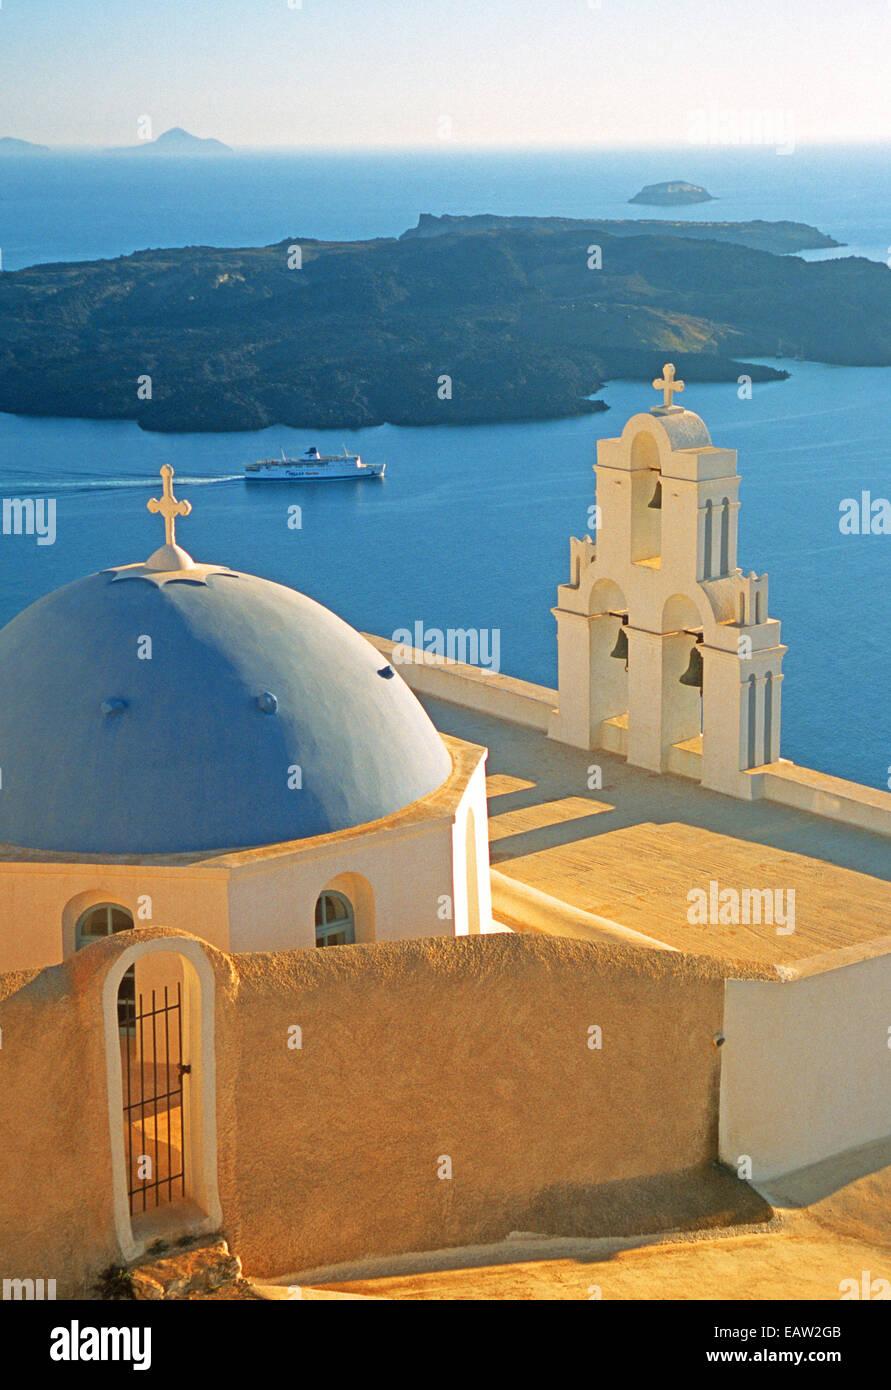 Kimis Theotokov Greek Orthodox Church at Fira, Santorini, Greek Isles. - Stock Image